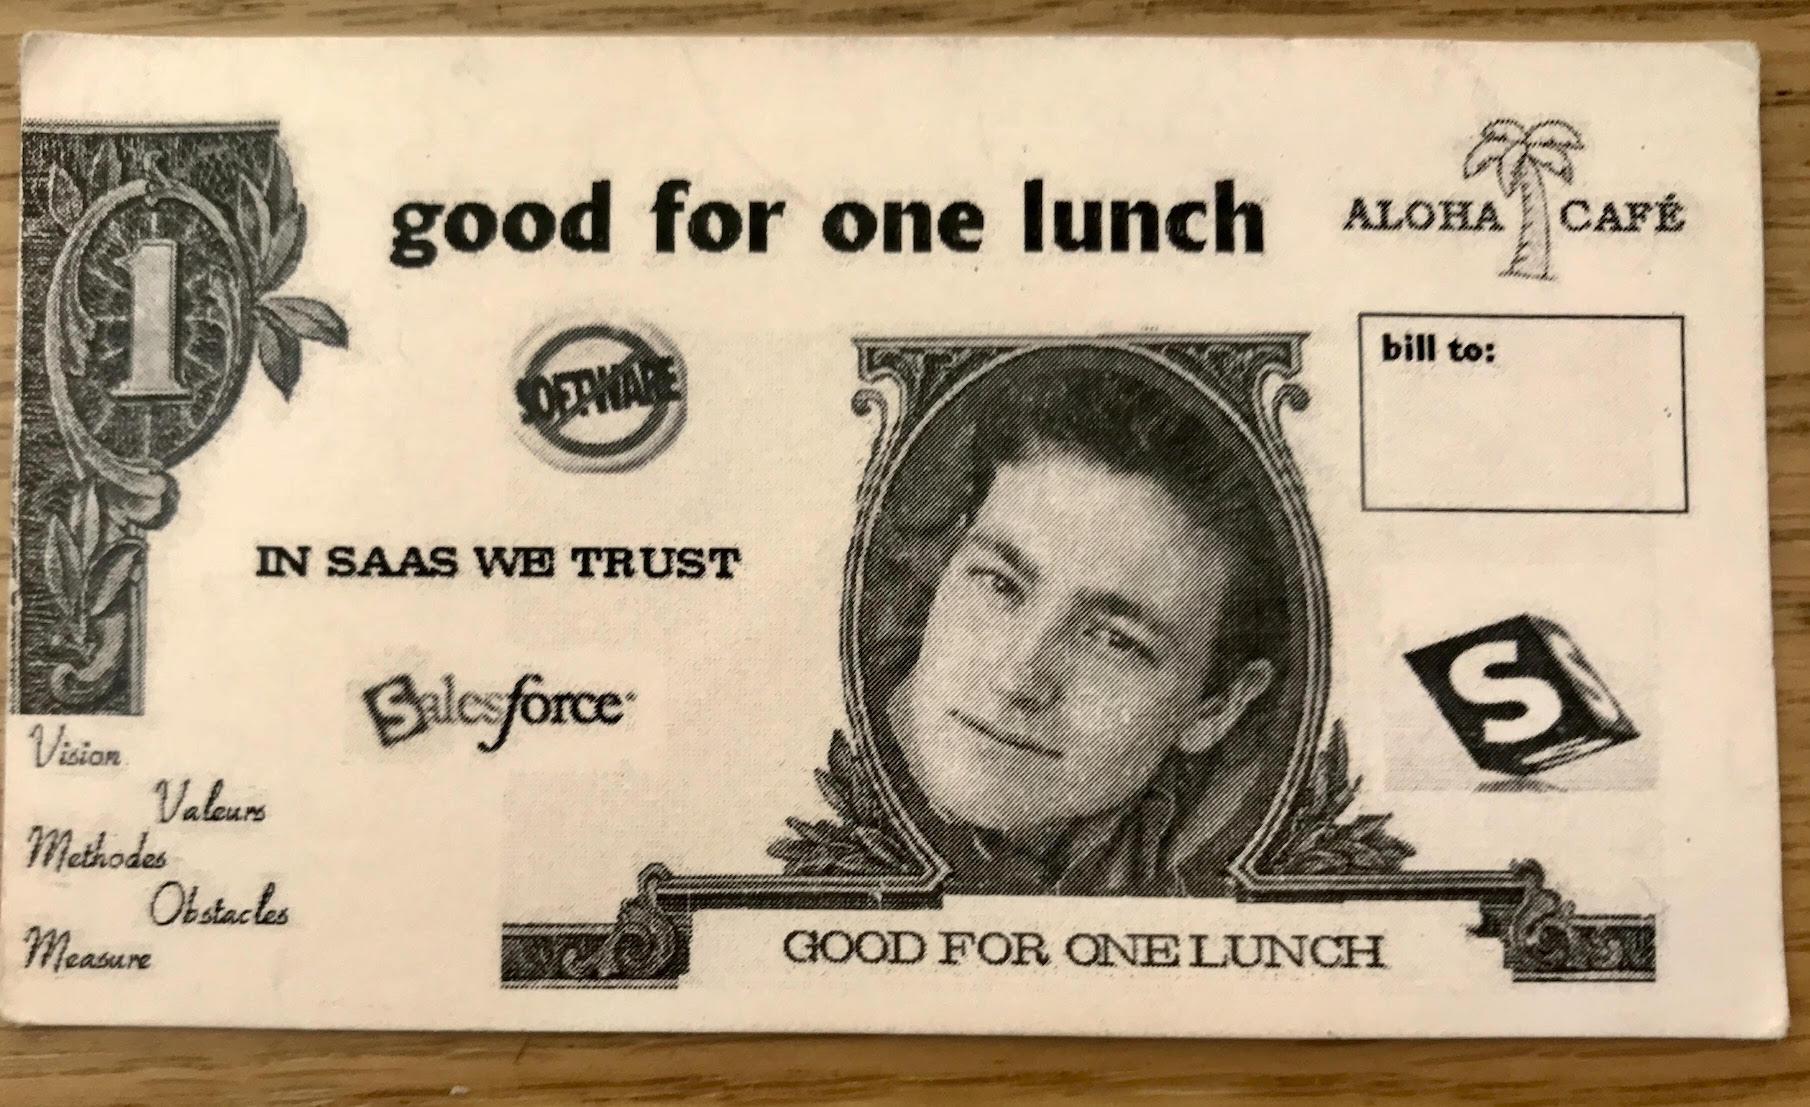 Original Localization Unconference Lunch Voucher from Salesforce